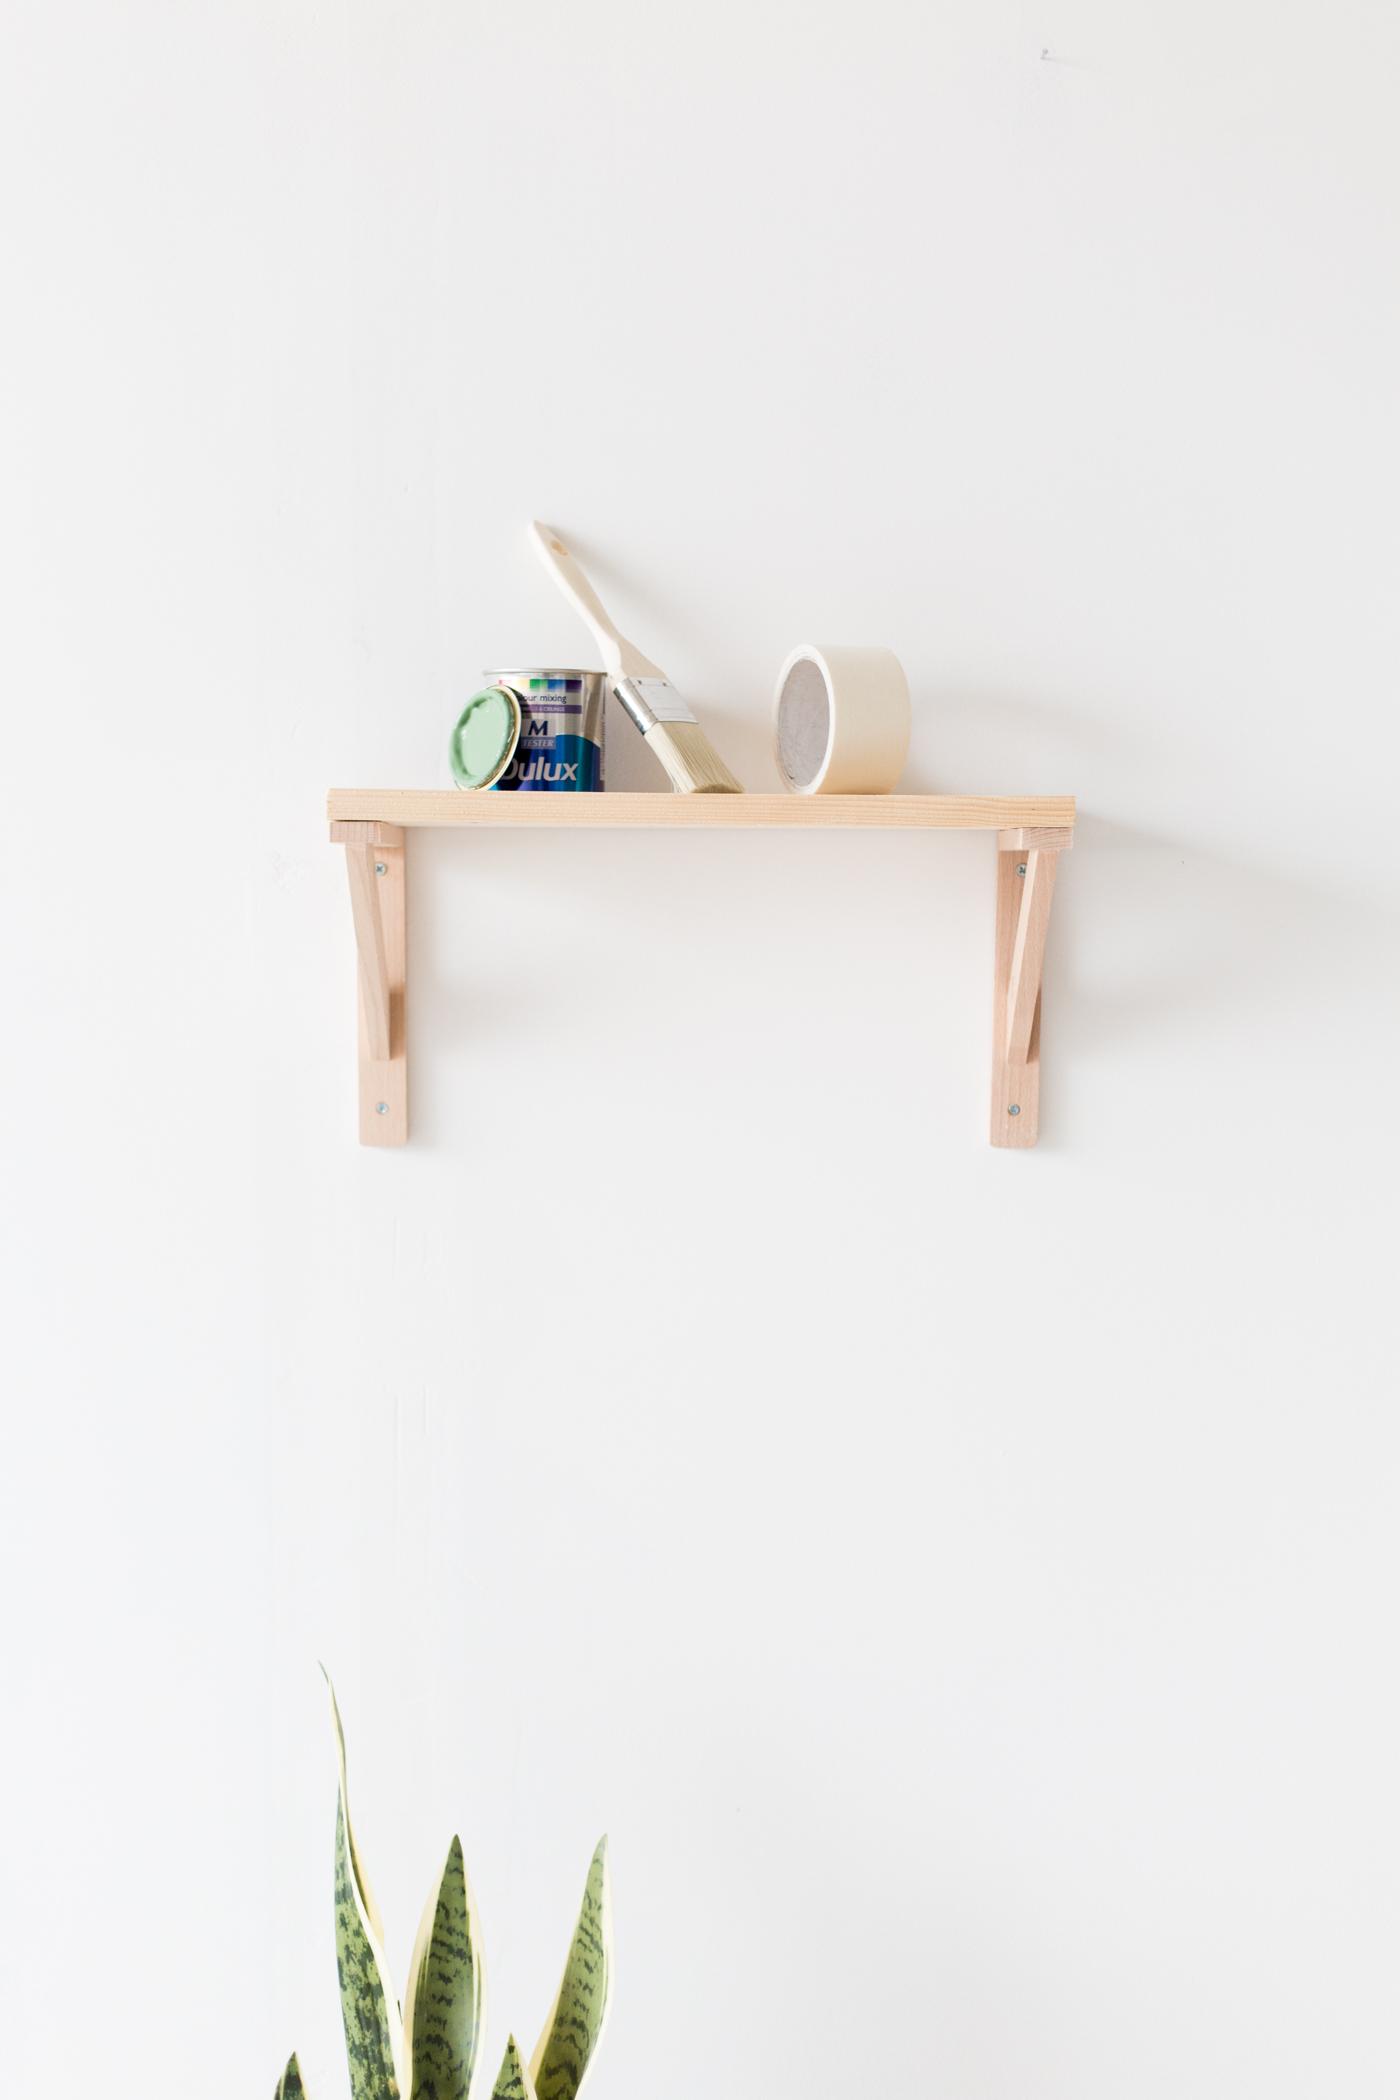 painted-christmas-tree-shelf-with-dulux-fallfordiy-1